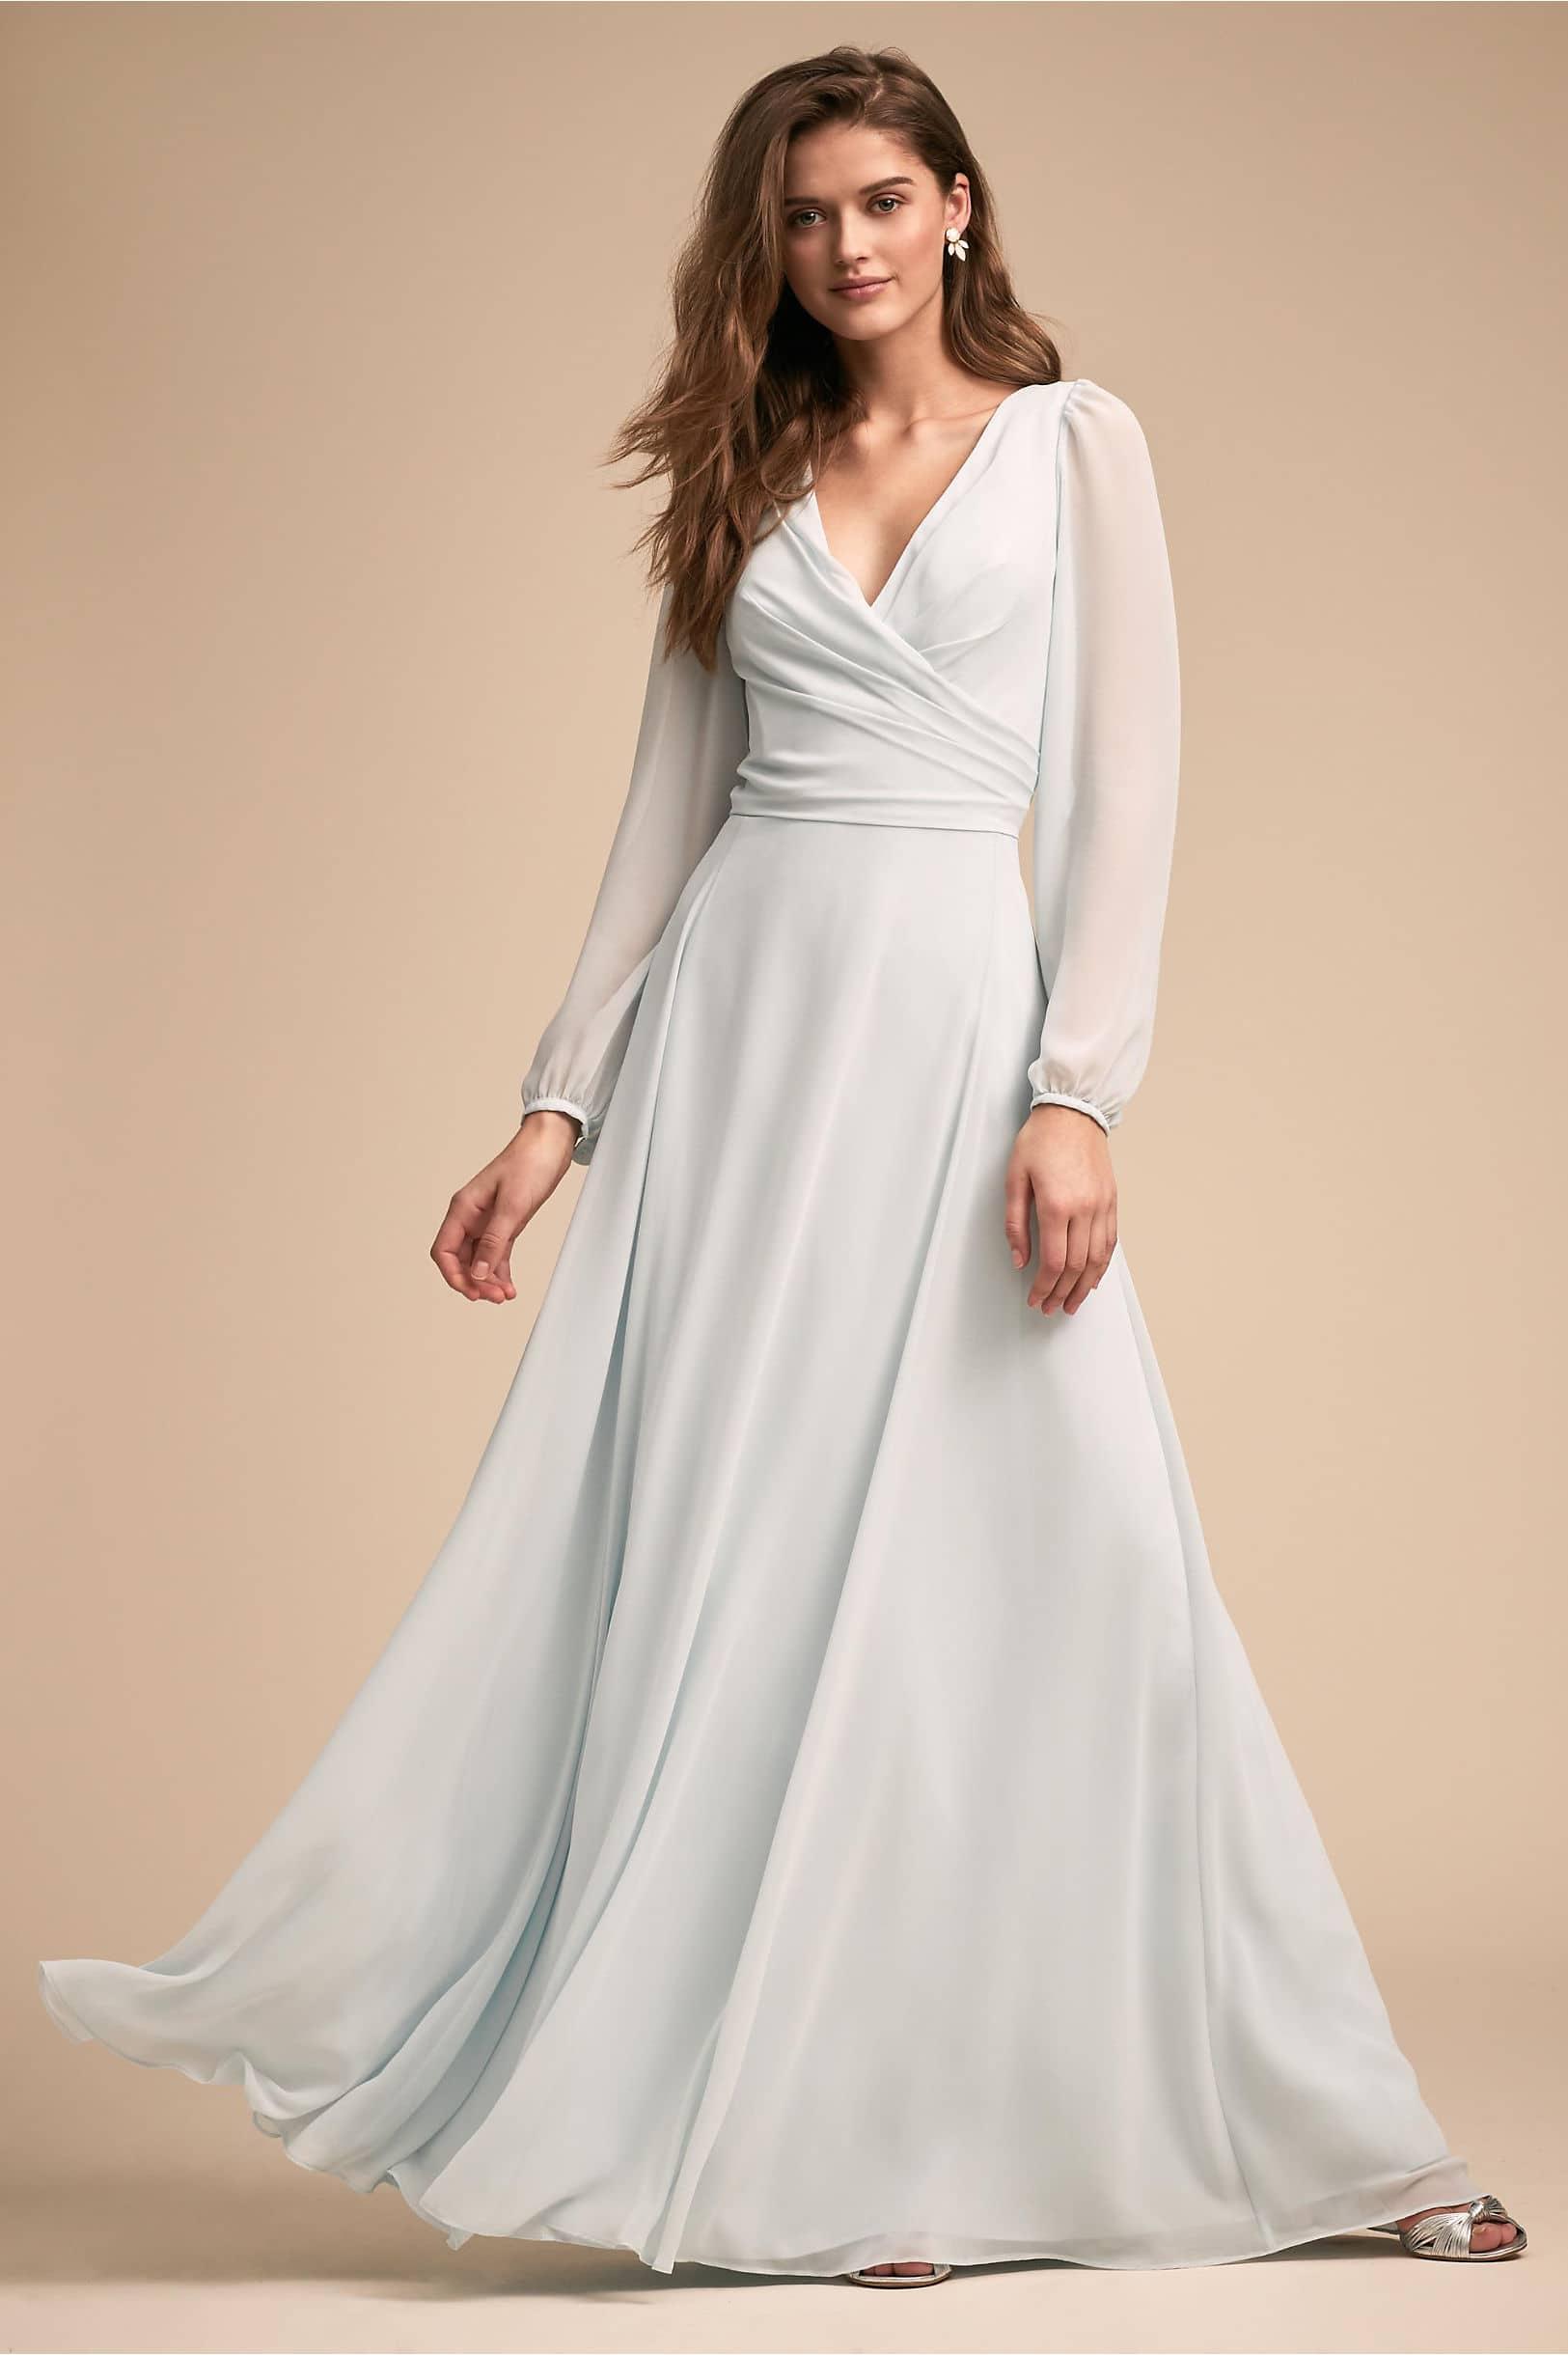 Louer une robe de soiree a montreal